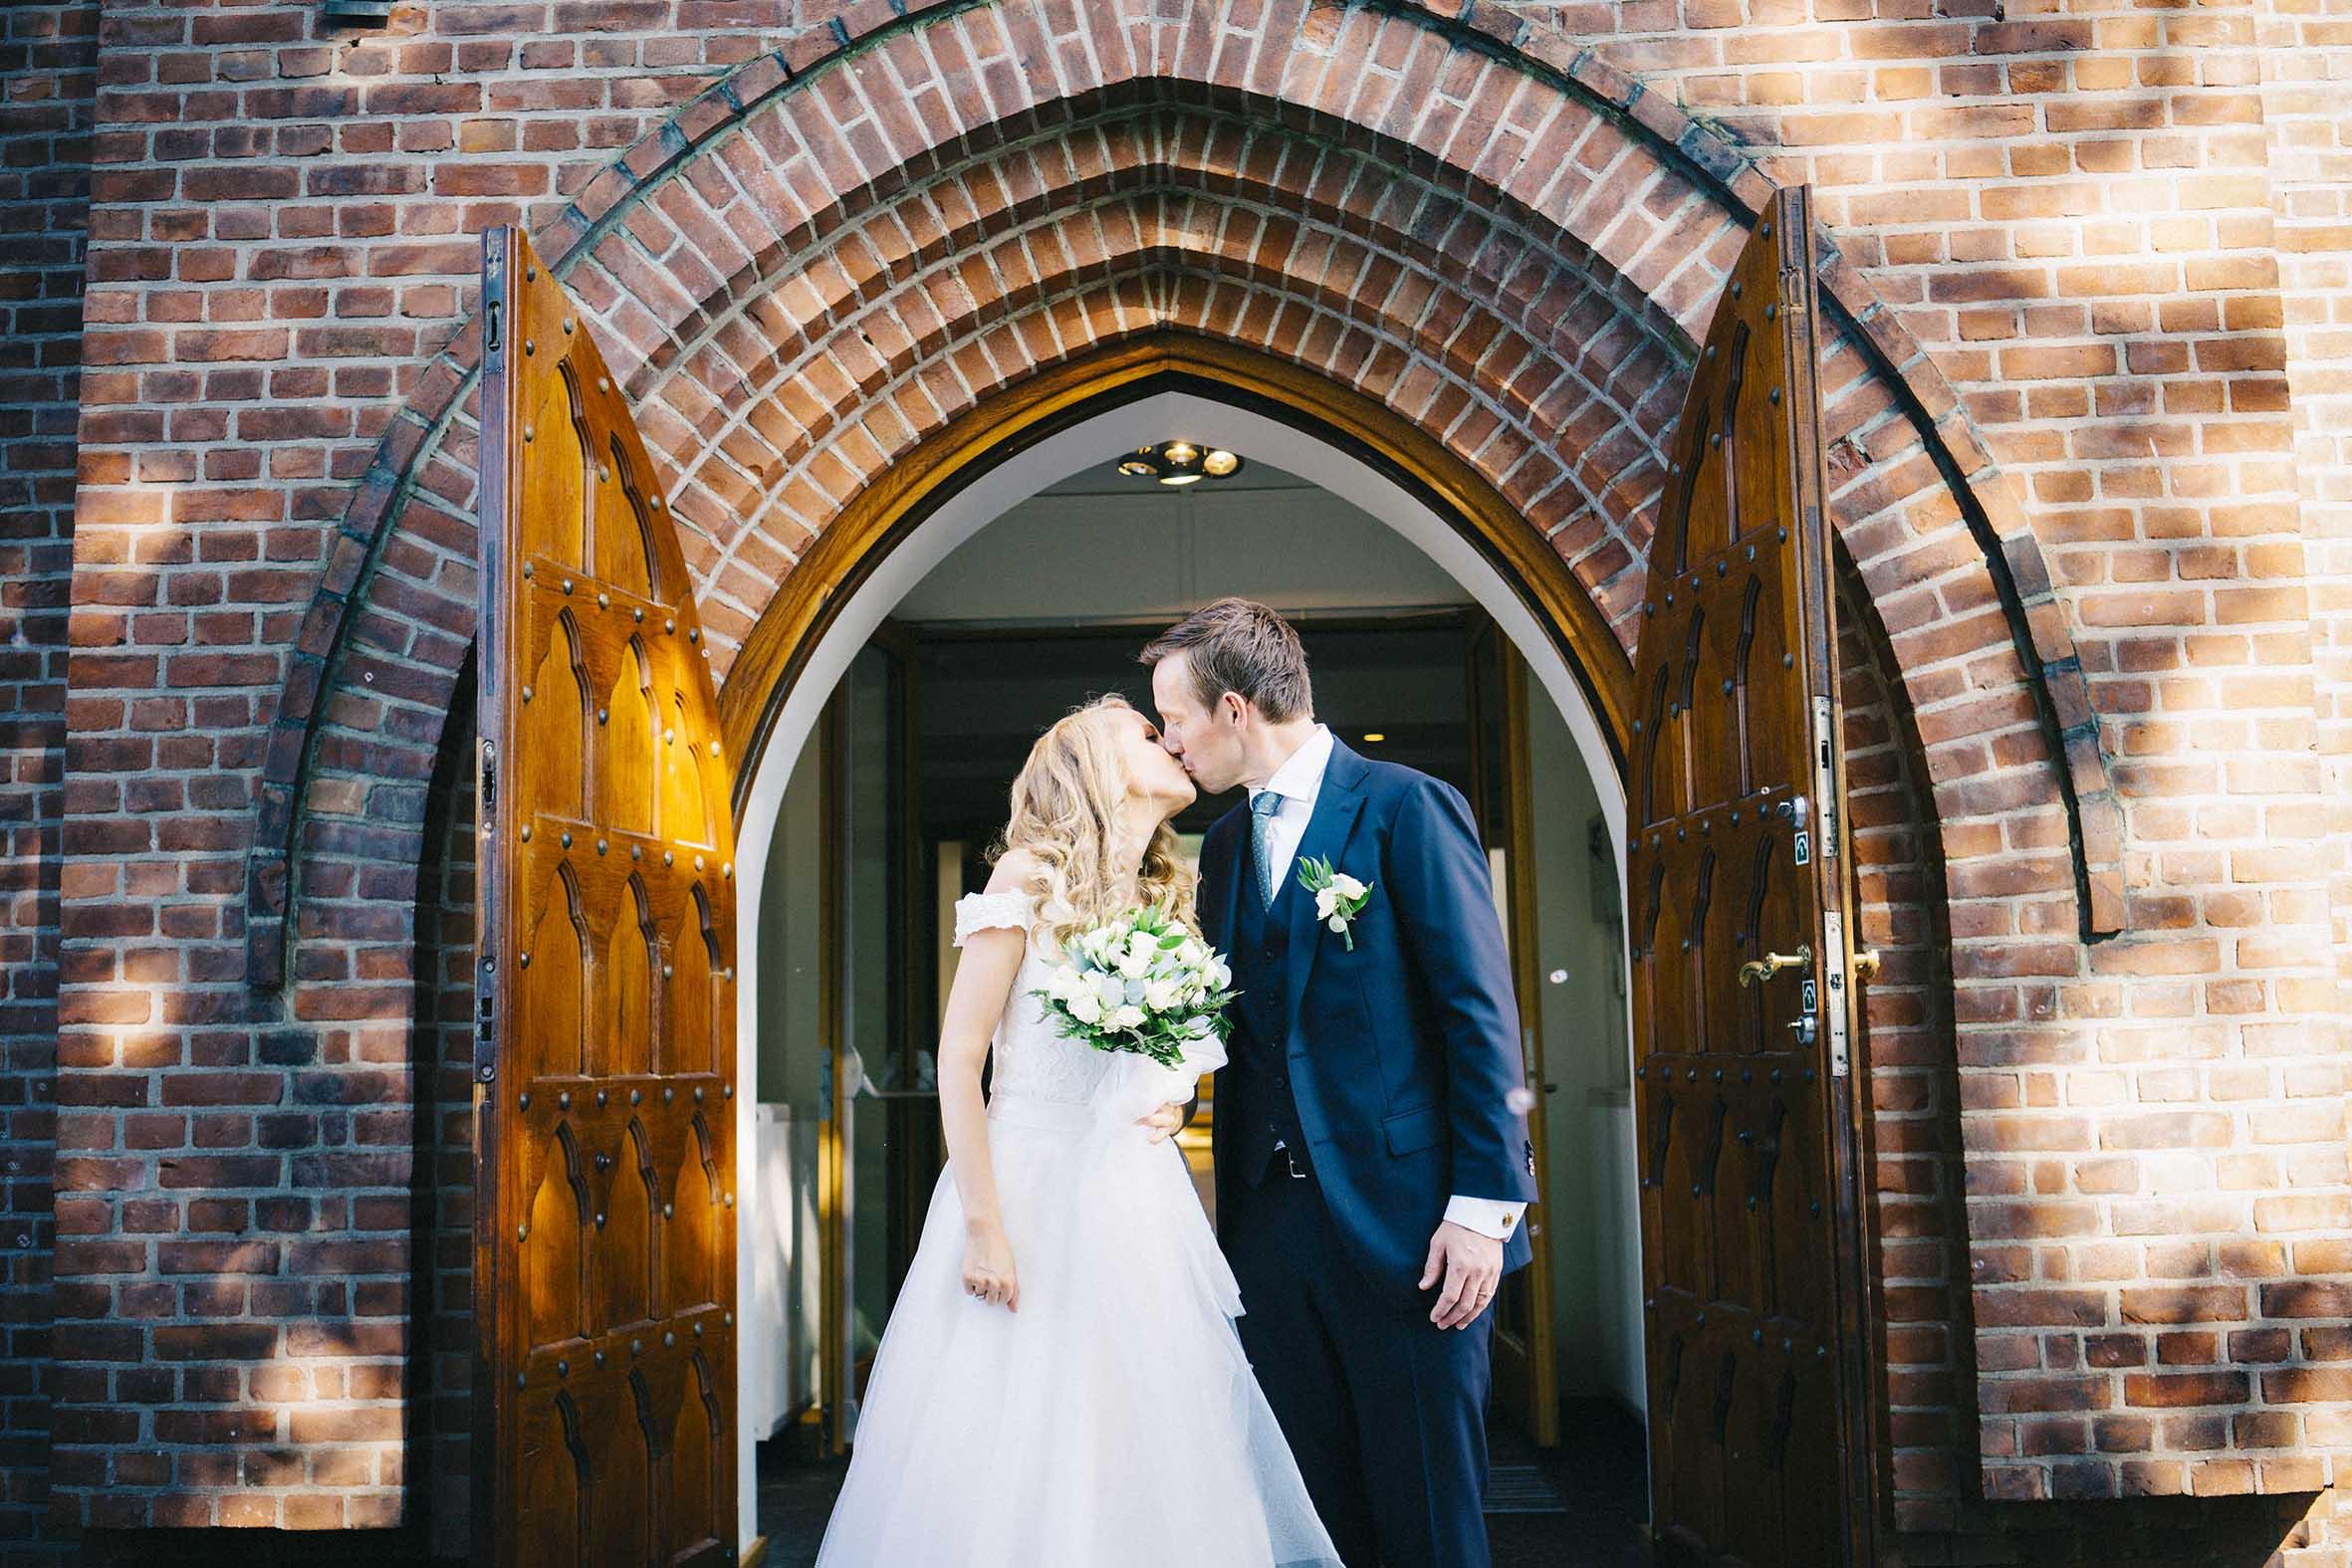 Brudepar kysse på trappen etter vielse, høstbryllup fra Ekeberg